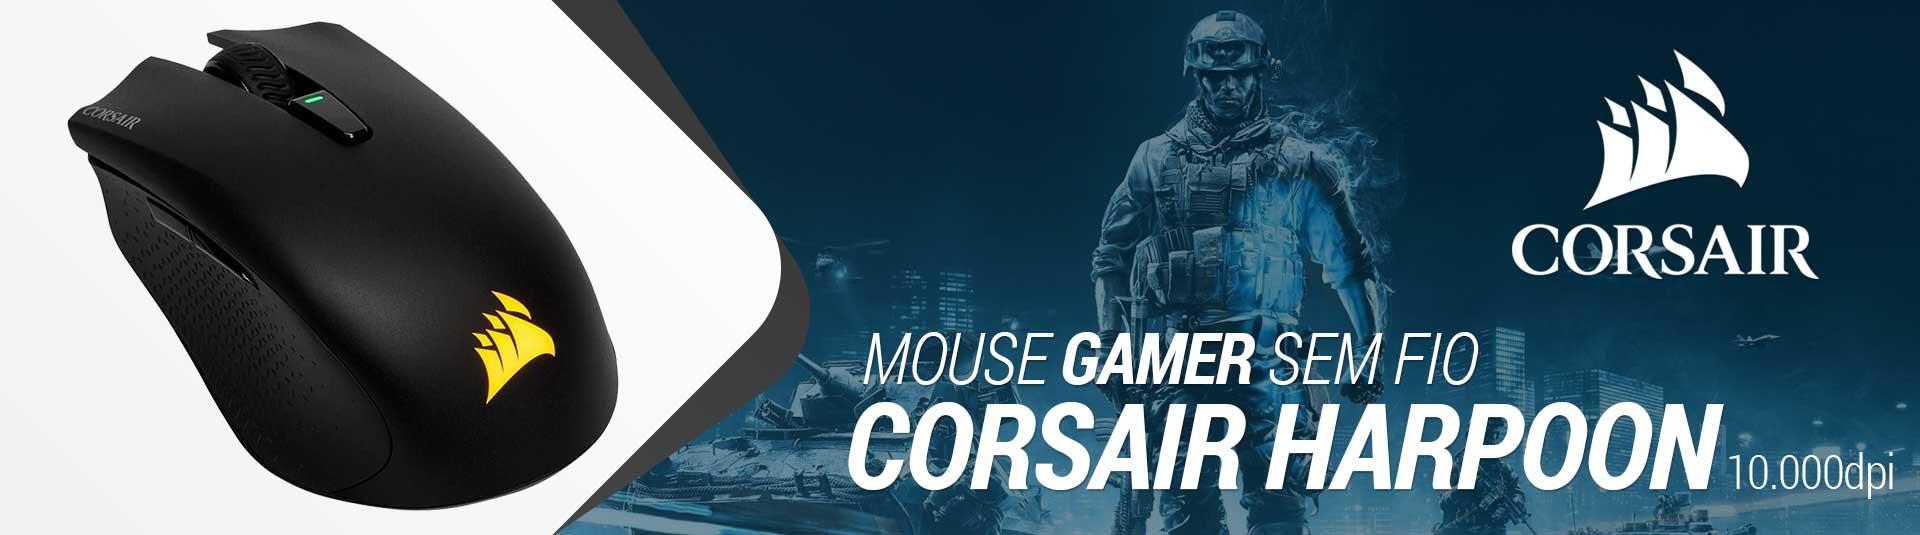 Mouse Gamer Wireless Corsair Harpoon